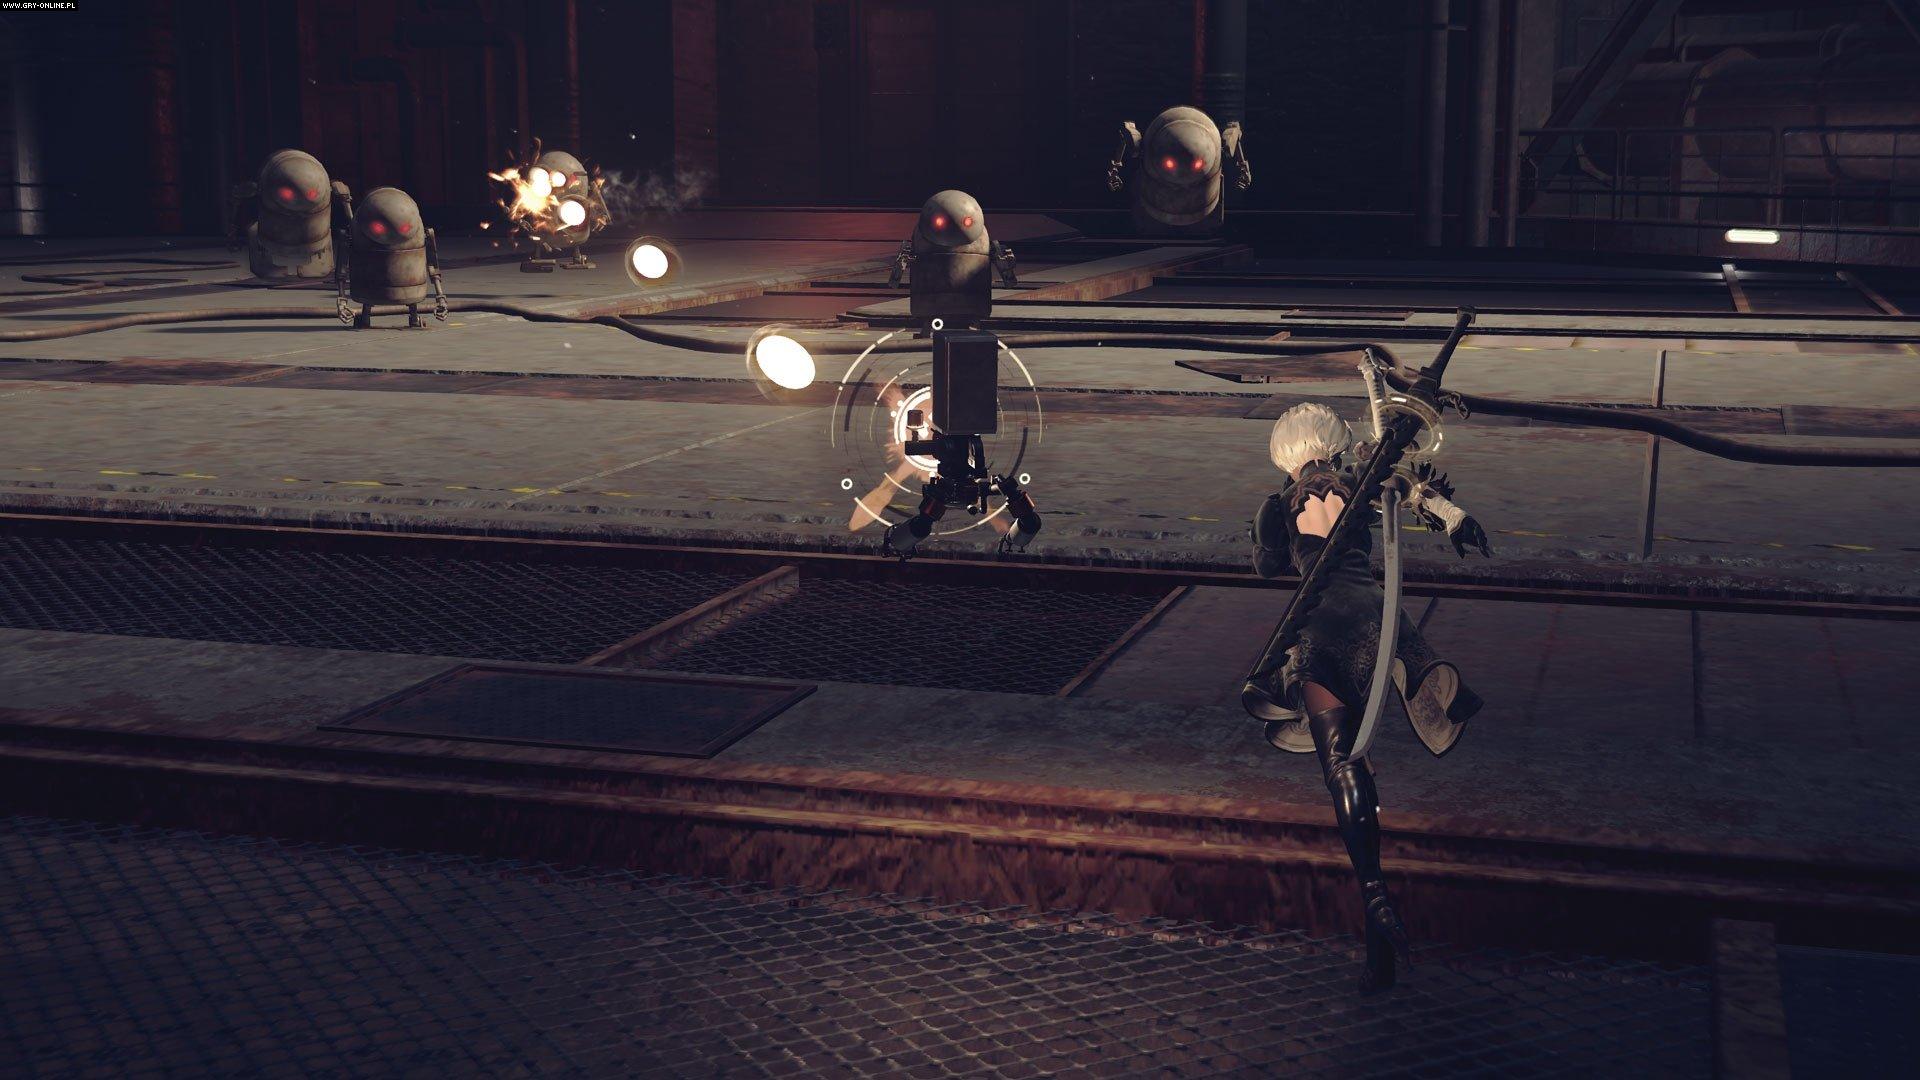 Nier: Automata PC, PS4 Games Image 13/64, PlatinumGames, Square-Enix / Eidos